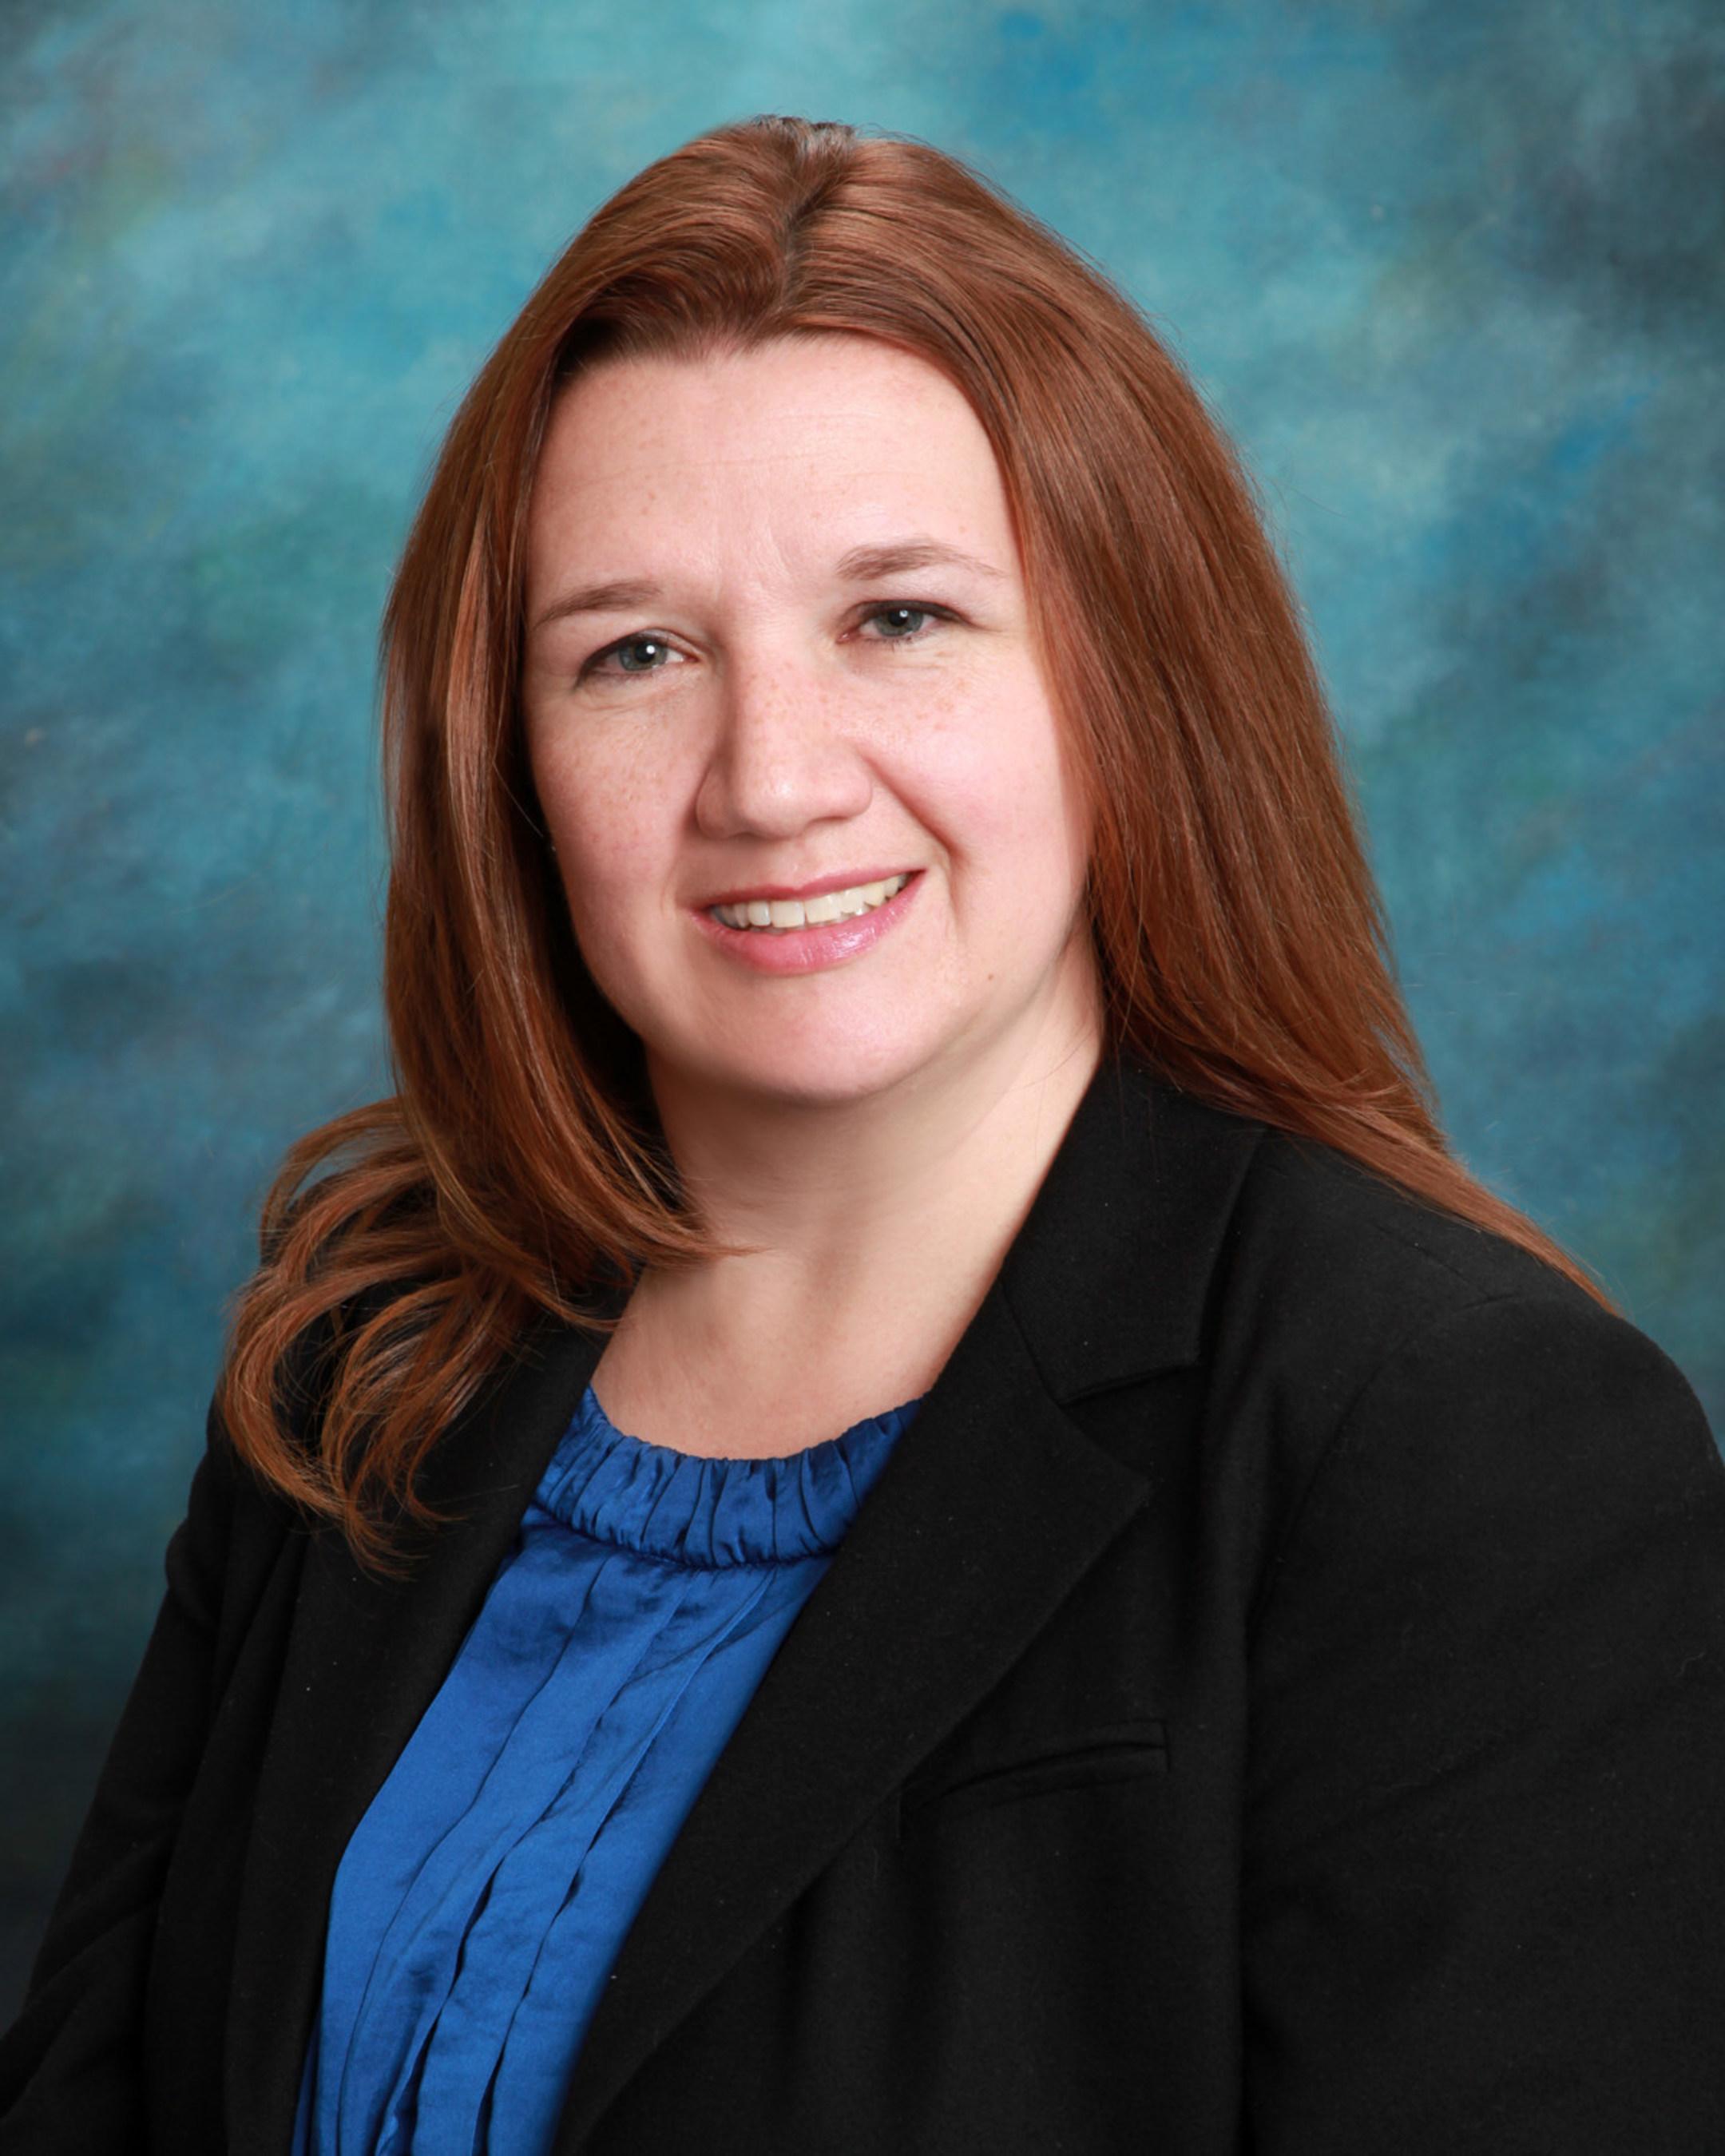 Lisa Fugate, vice president of credit processing, i2c inc.